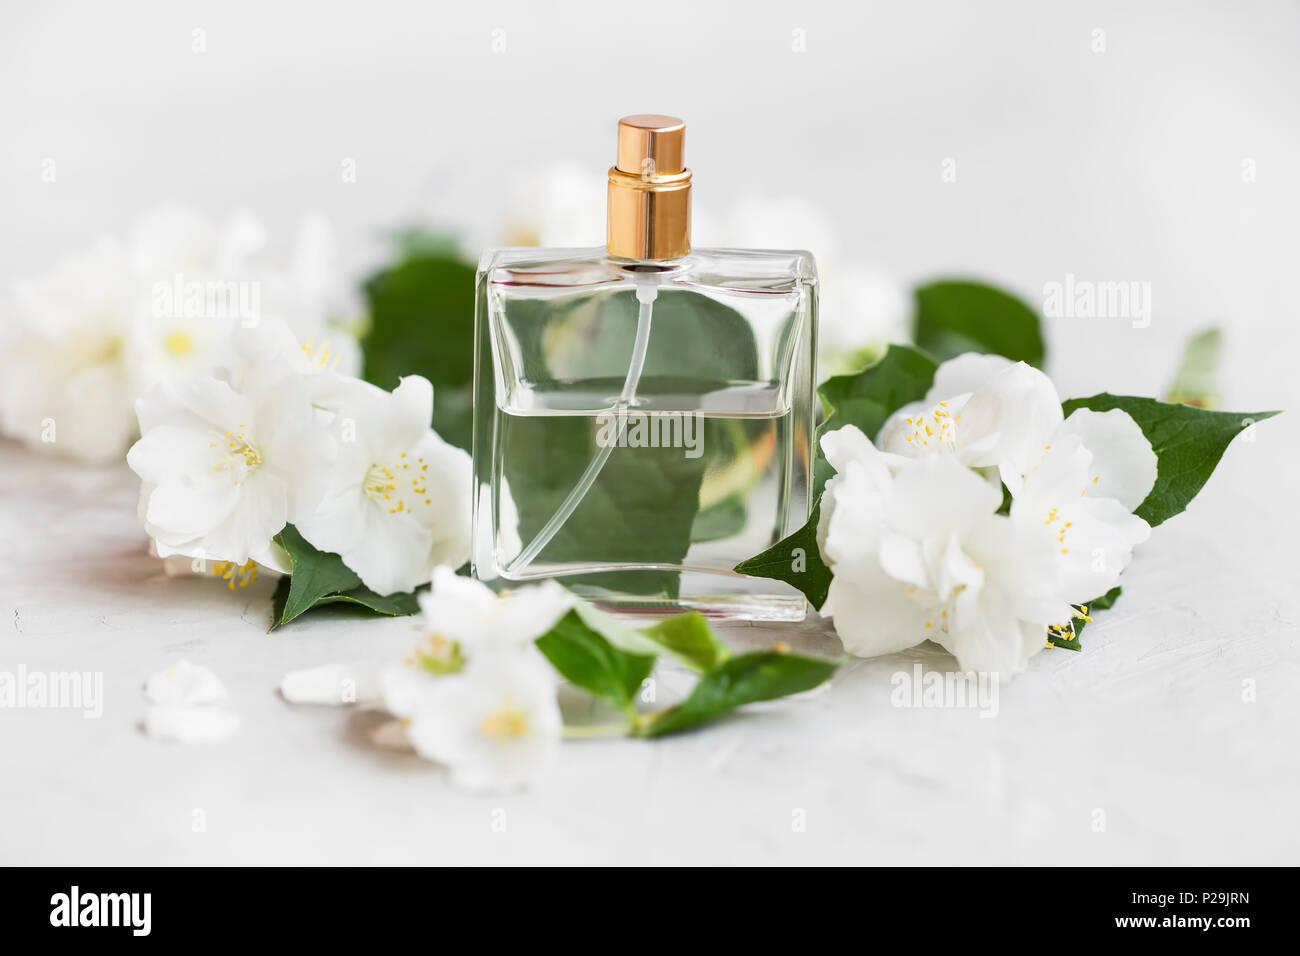 Floral jasmine perfume in transparent bottle with jasmine flowers floral jasmine perfume in transparent bottle with jasmine flowers izmirmasajfo